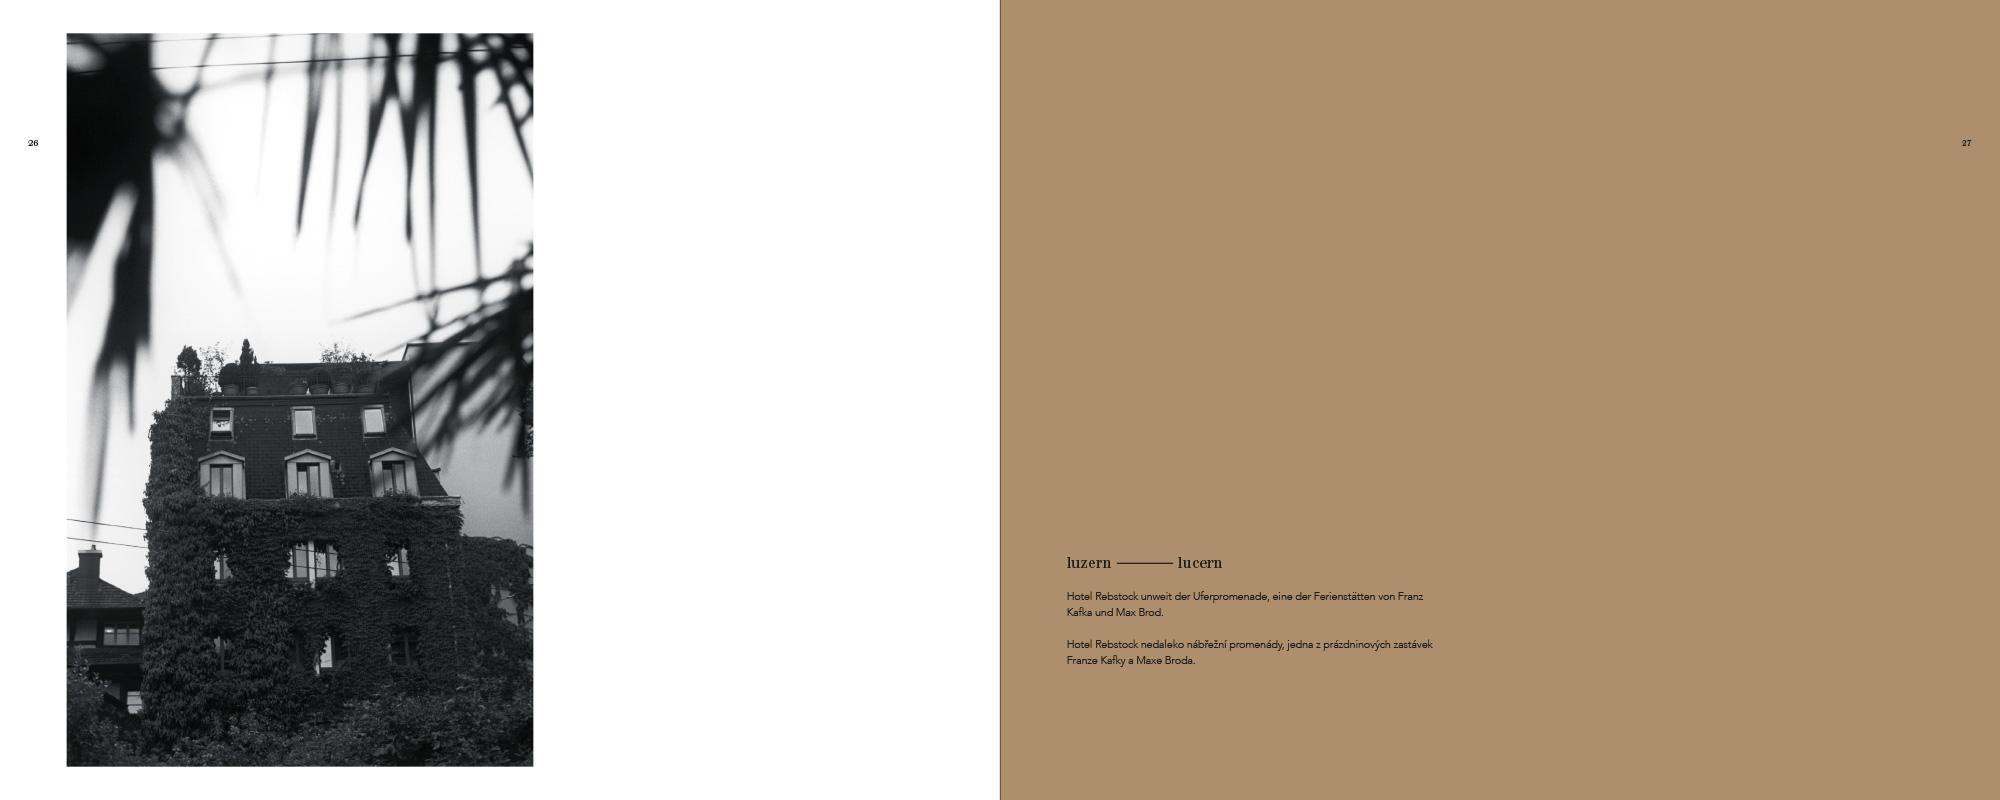 [album/Products_Model_Product/69/Kafka_Cesty_2-30.jpg]